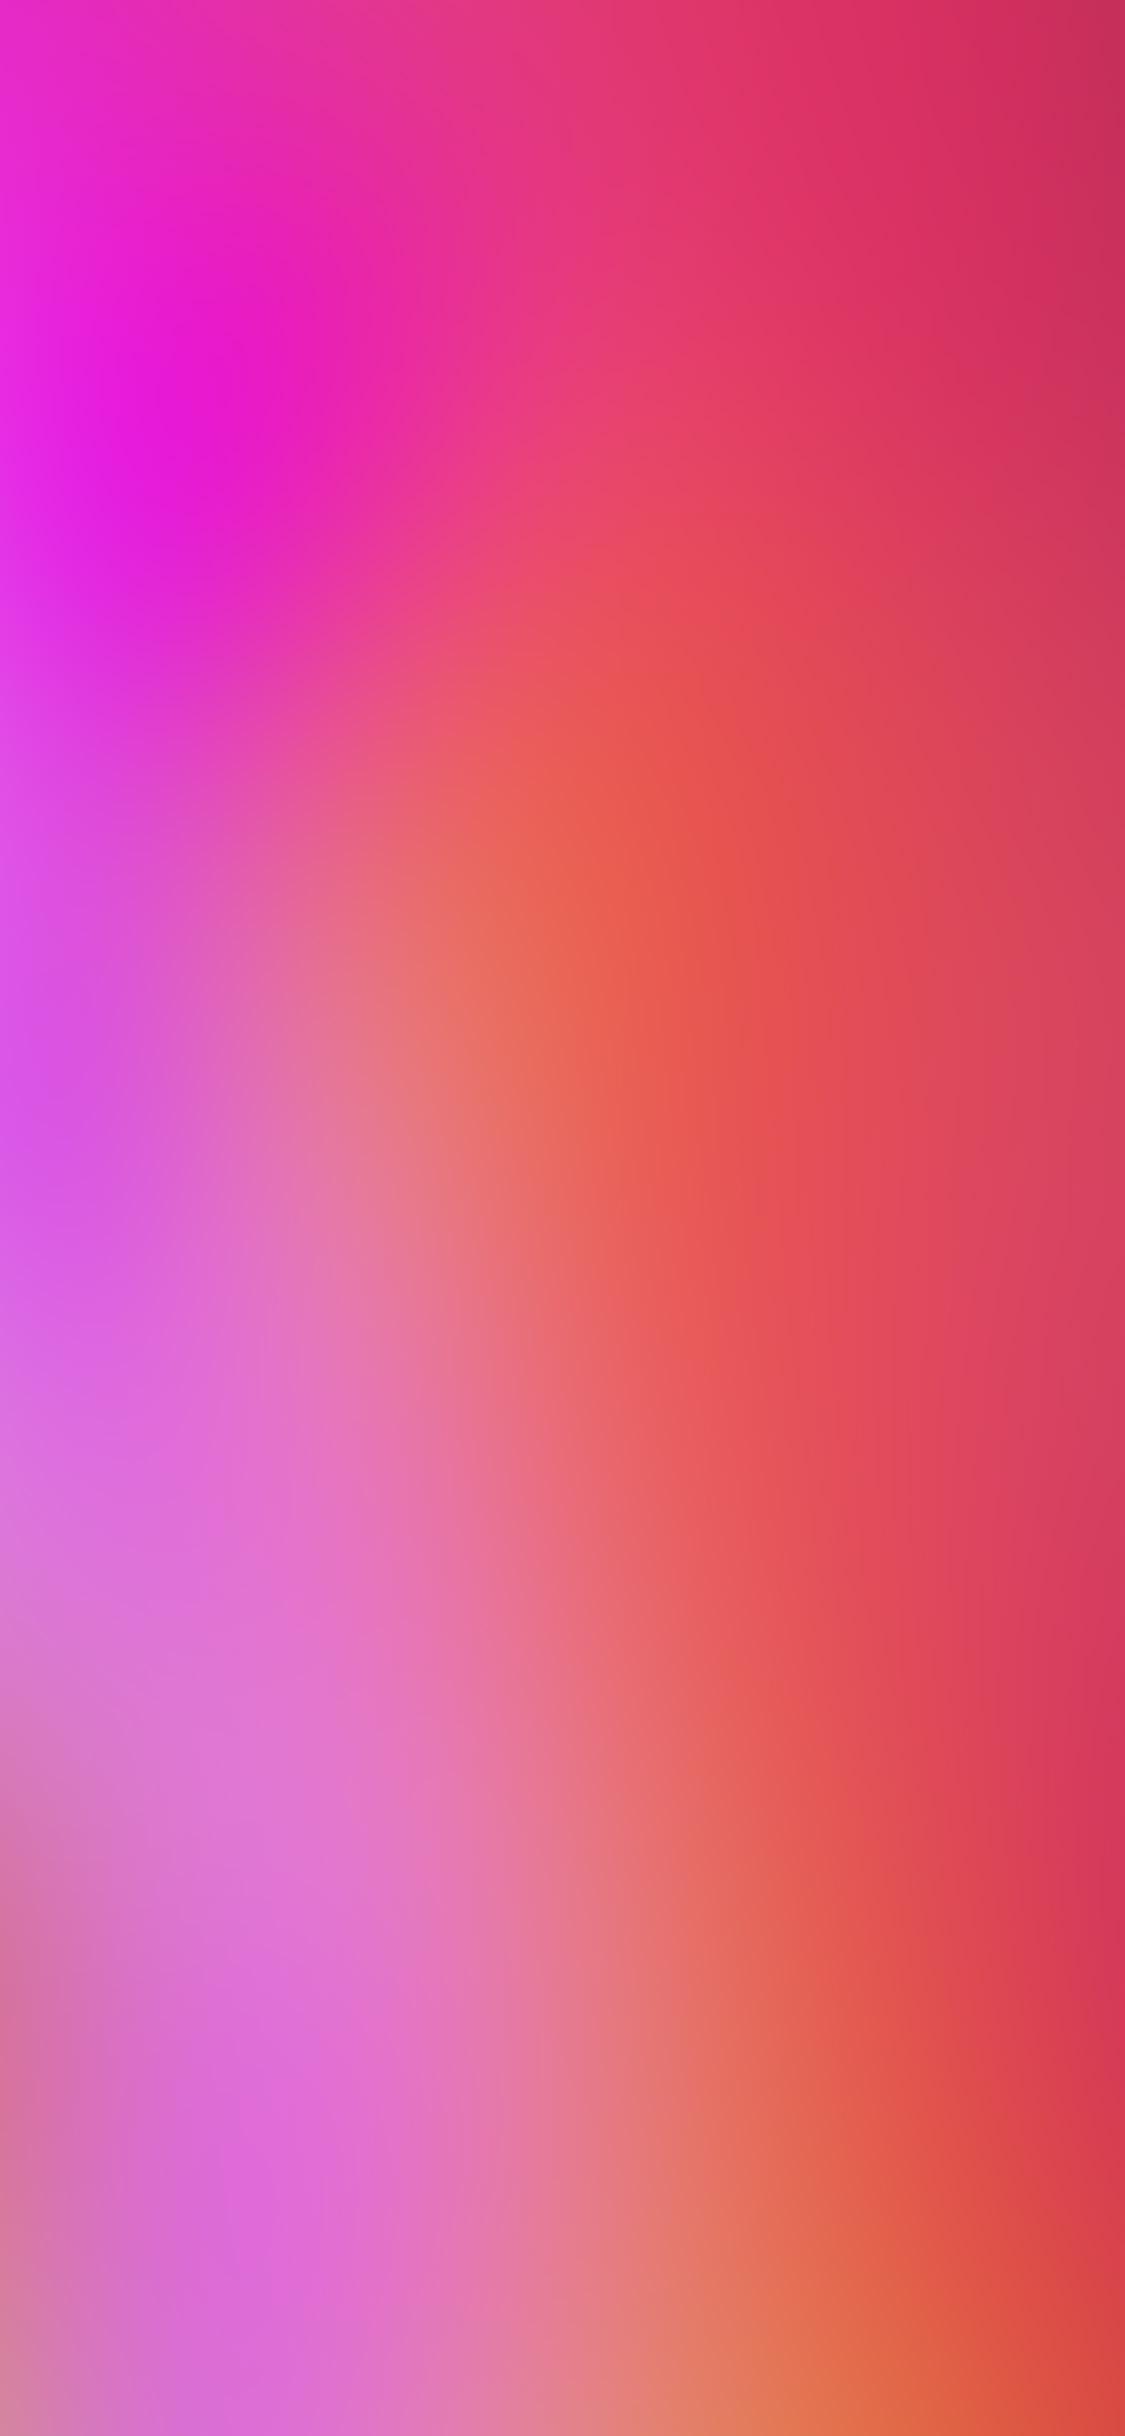 iPhonexpapers.com-Apple-iPhone-wallpaper-so30-blur-gradation-red-orange-hot